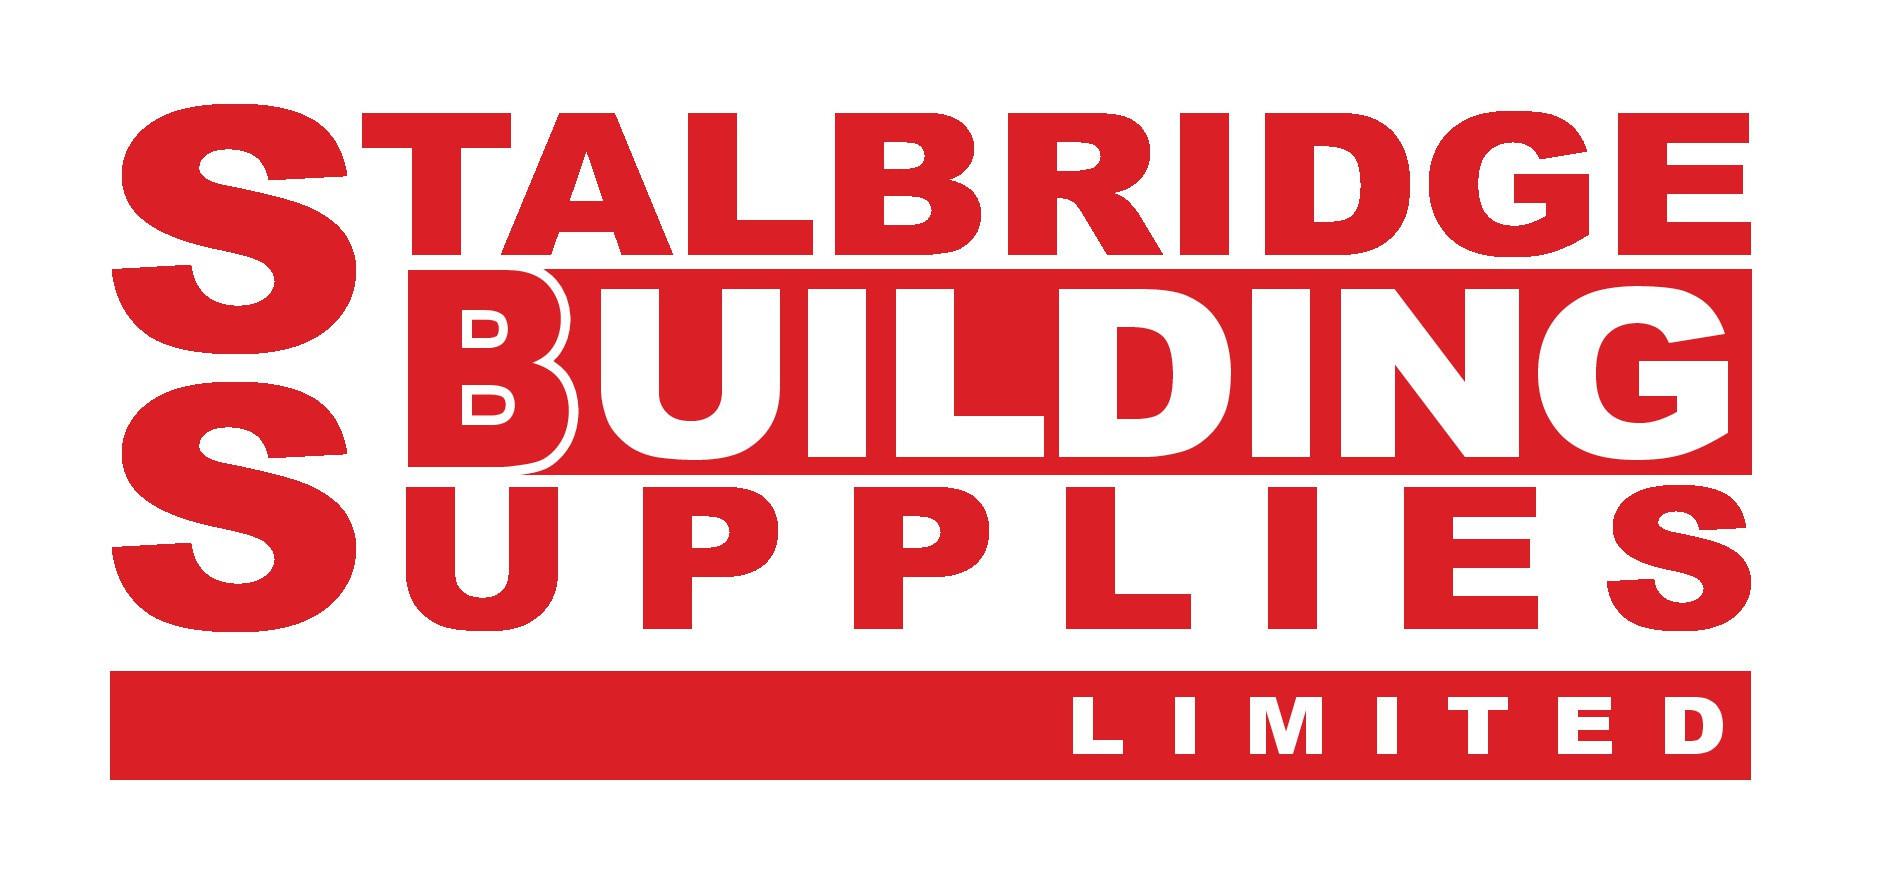 Stalbridge Building Supplies Ltd